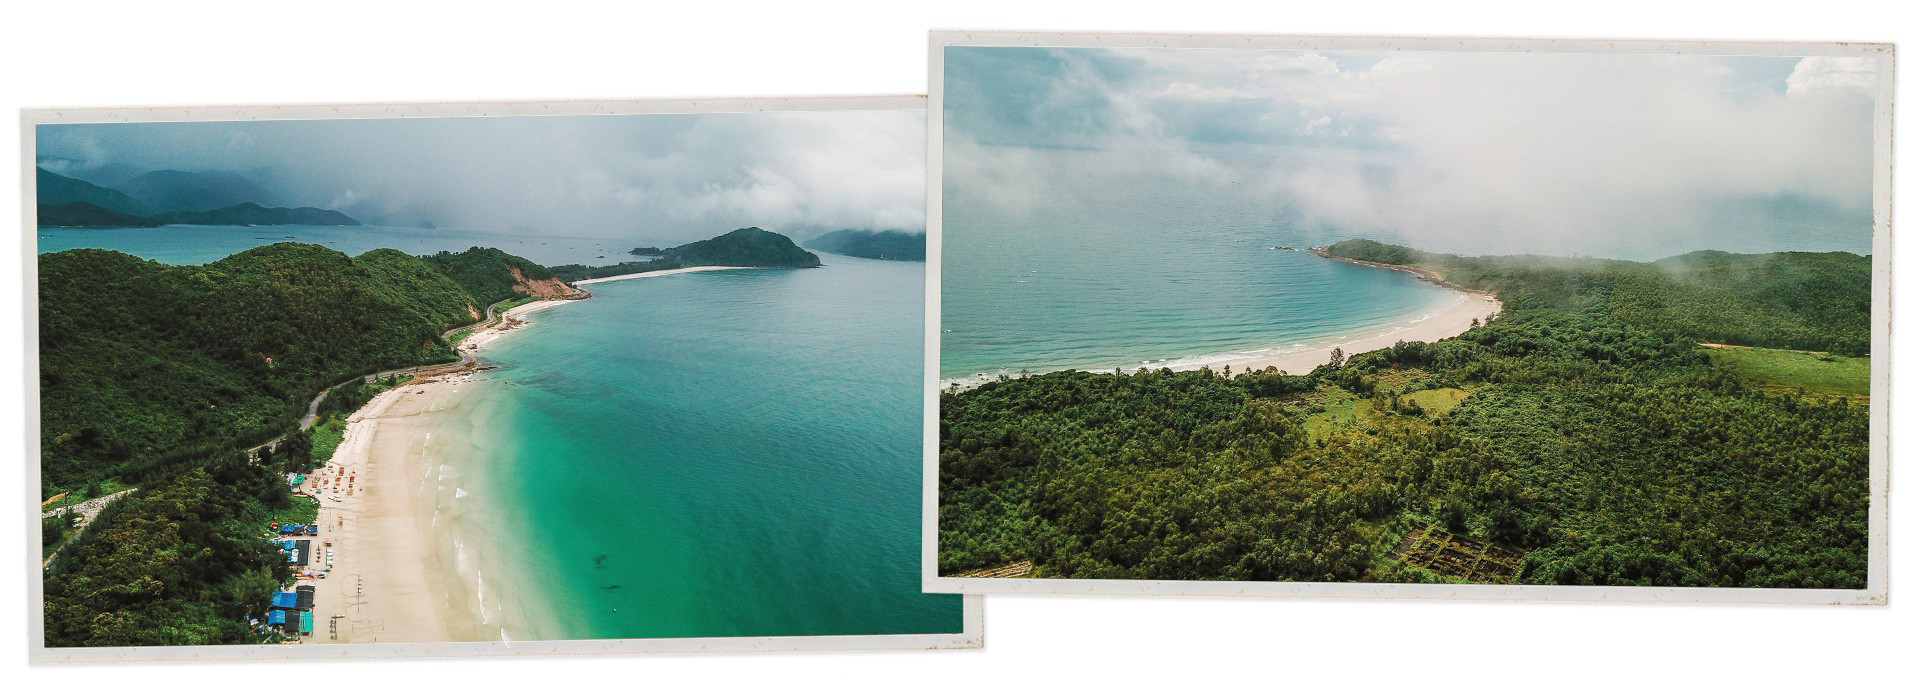 Aerial views of Quan Lan Beach in Van Don District, Quang Ninh Province, Vietnam. Photos: Nguyen Khanh / Tuoi Tre